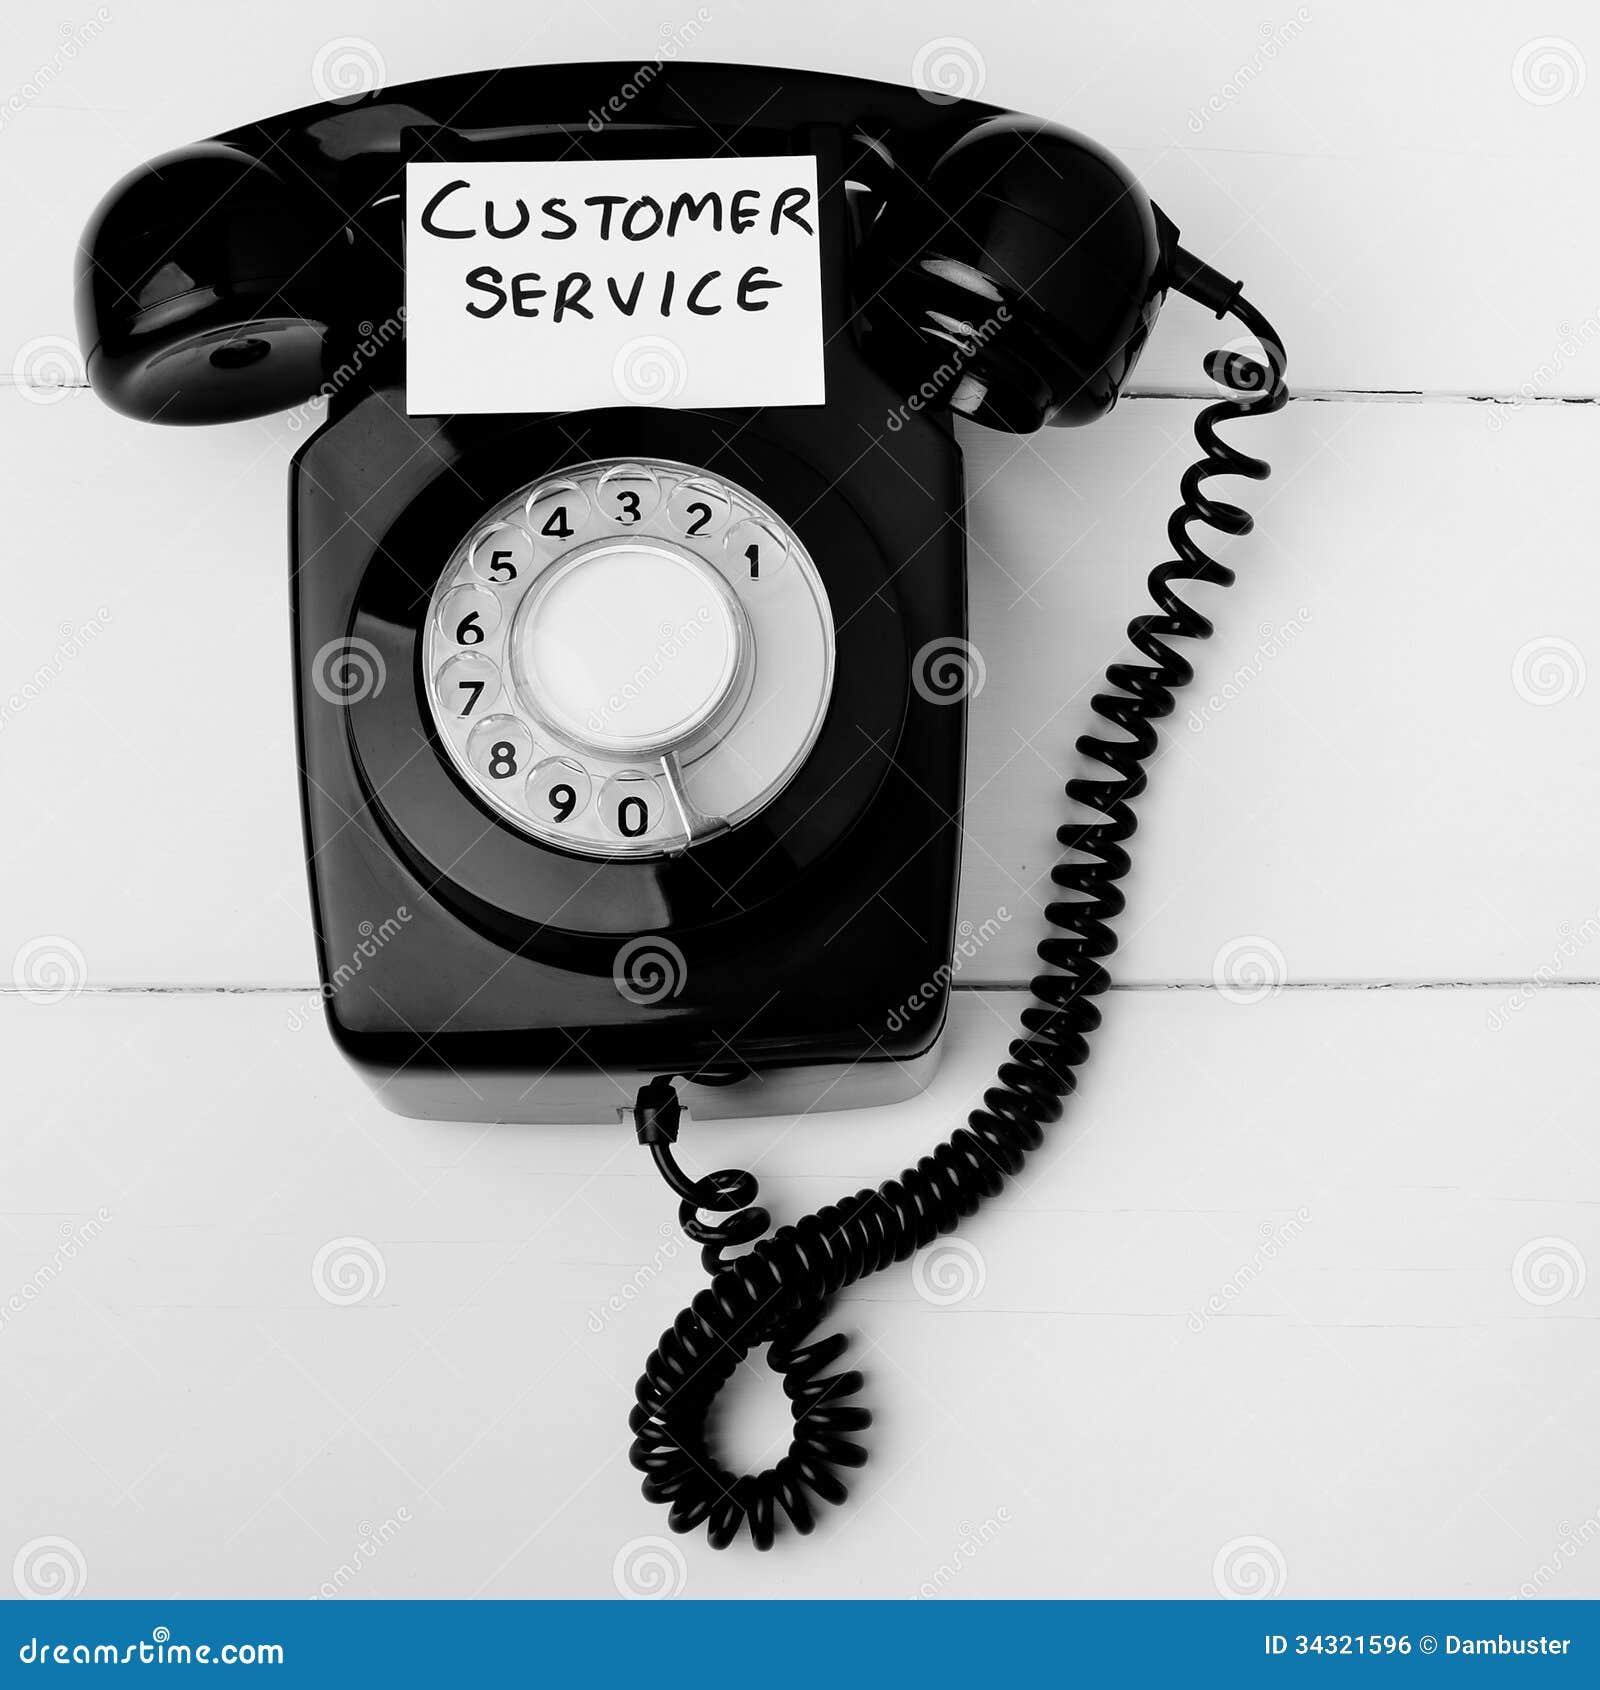 old fashioned customer service concept stock photo image 34321596. Black Bedroom Furniture Sets. Home Design Ideas